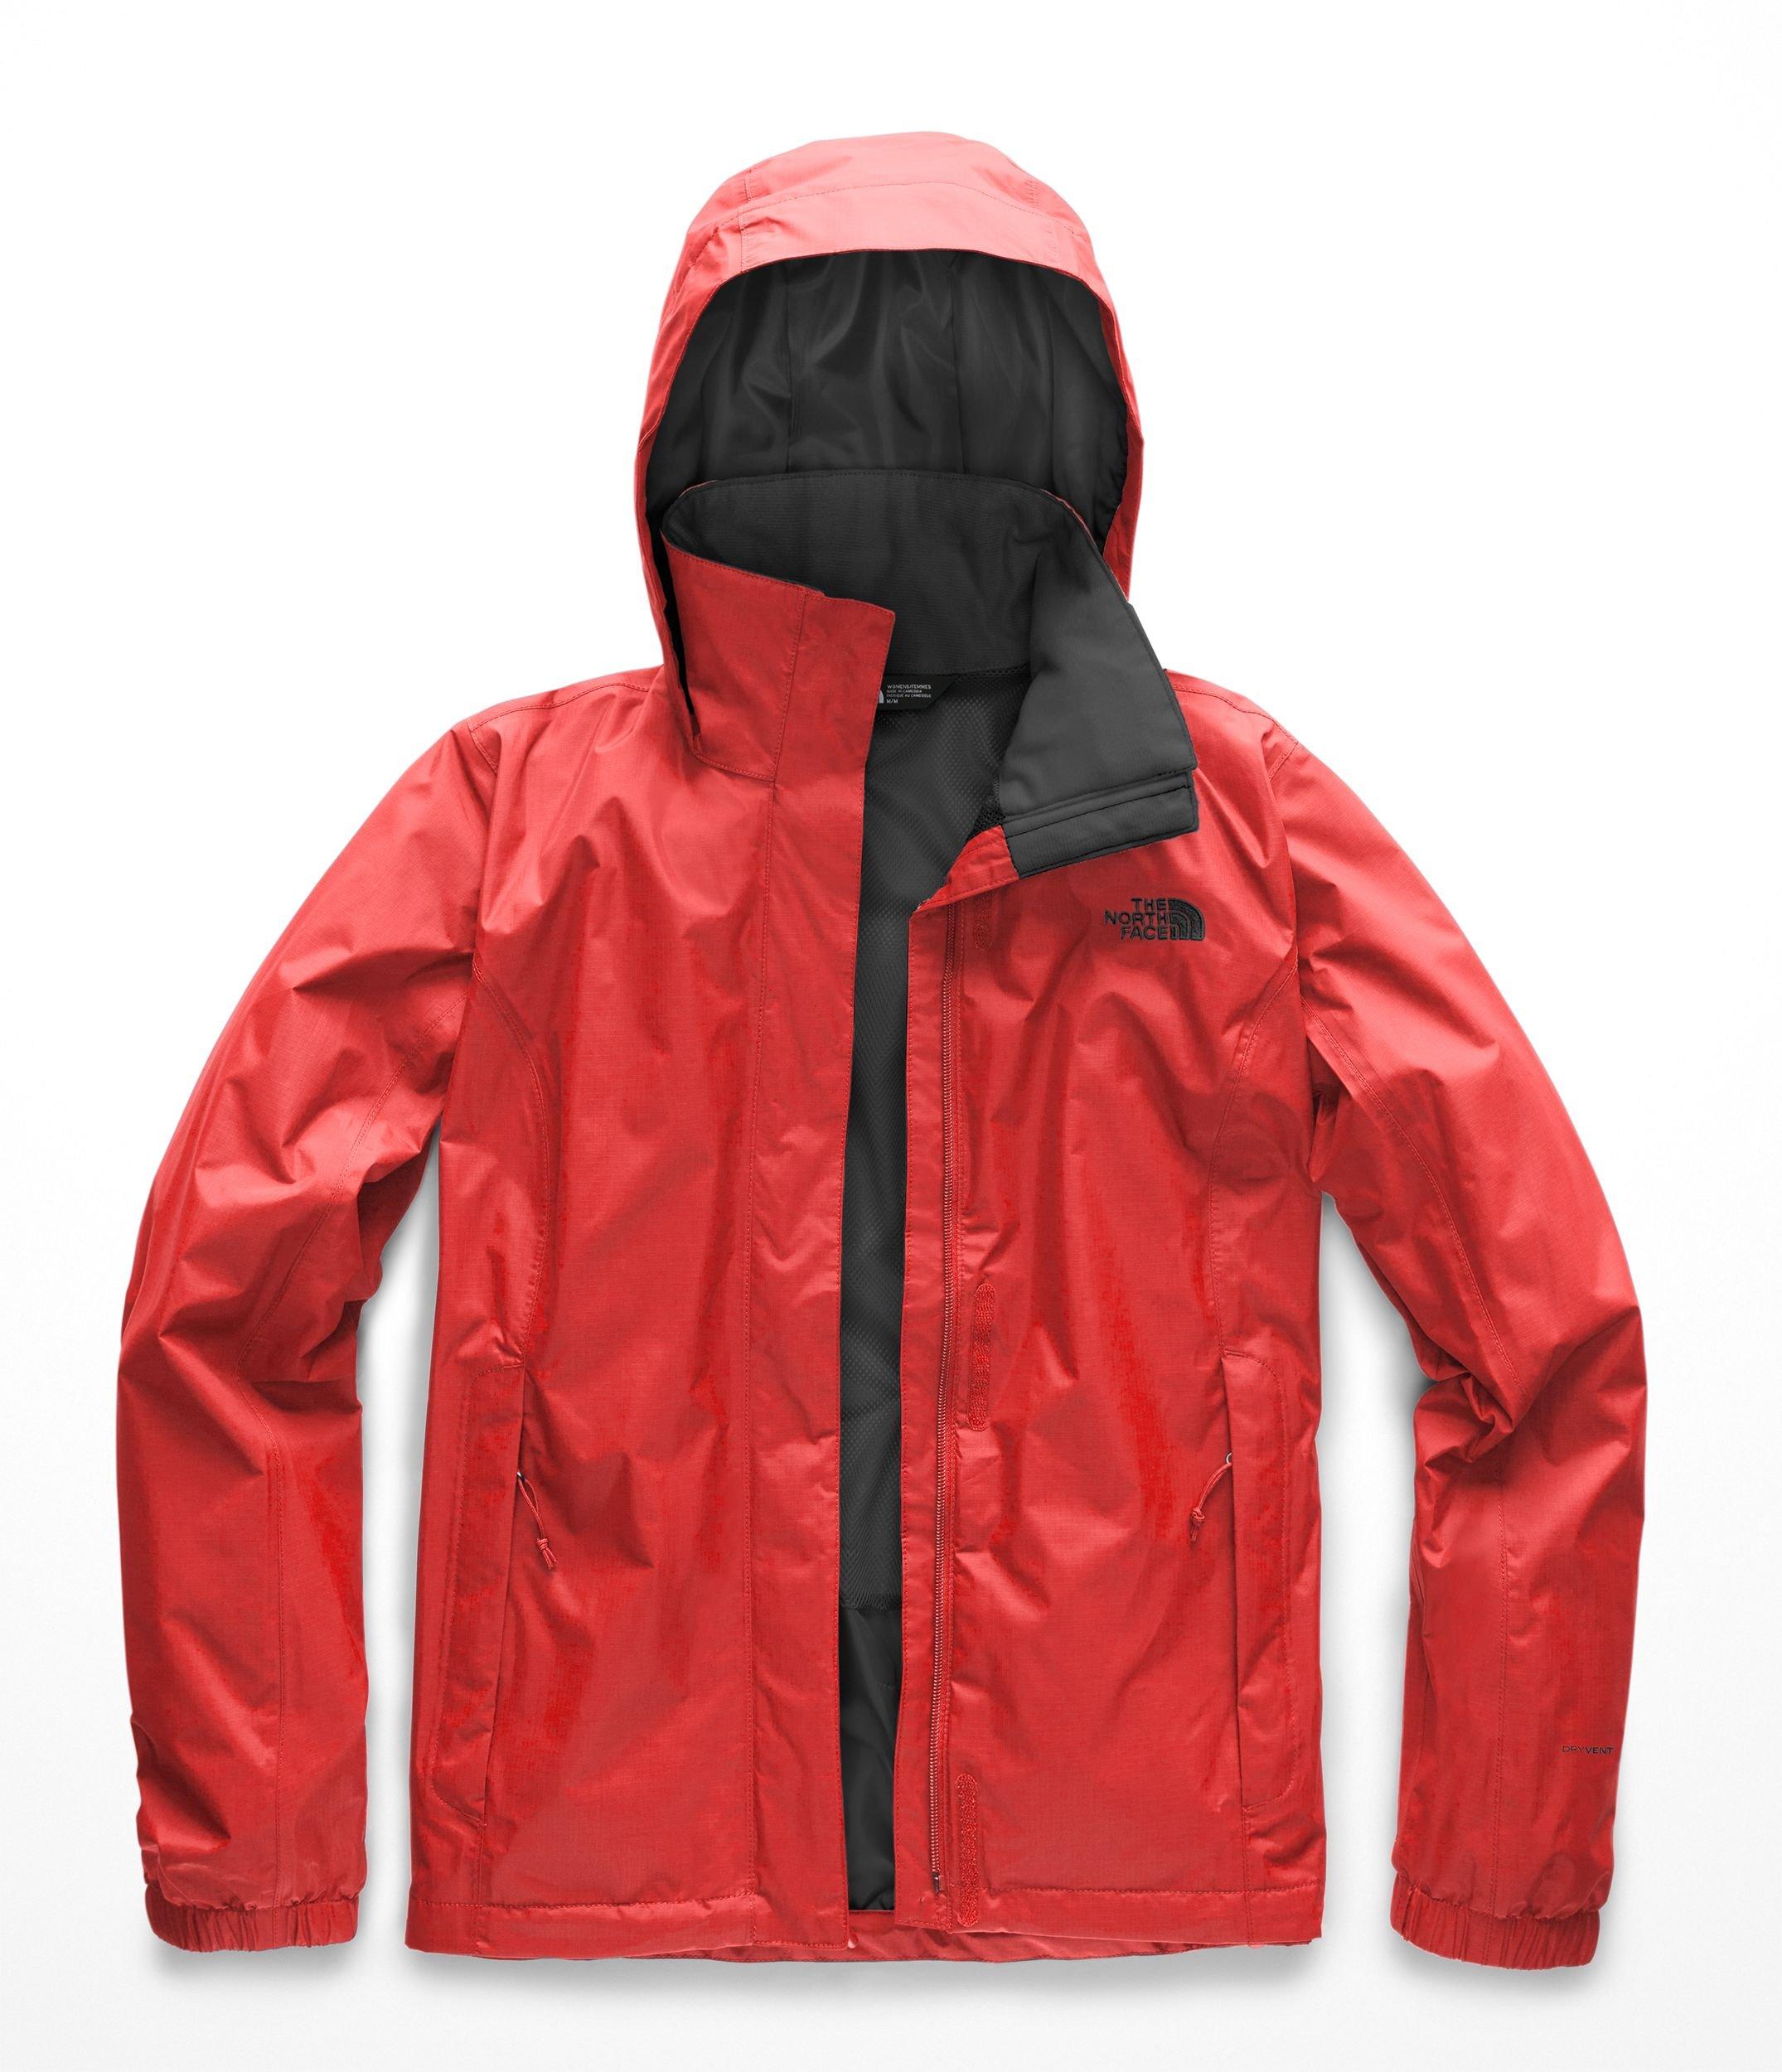 The North Face Women Resolve 2 Jacket - Juicy Red & Asphalt Grey - XL